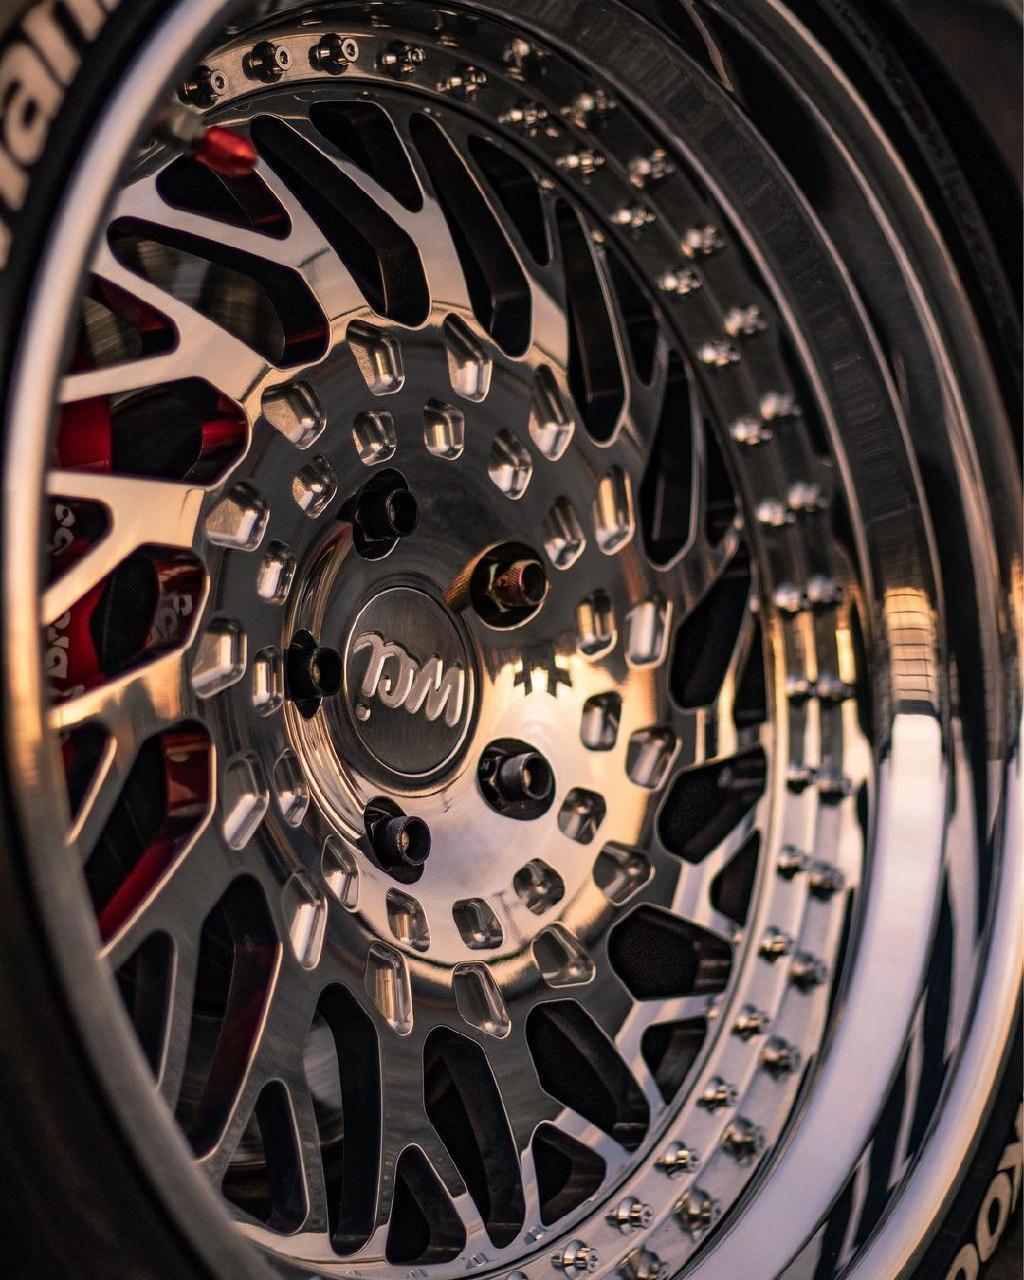 WATERCOOLED DB1 forged wheels